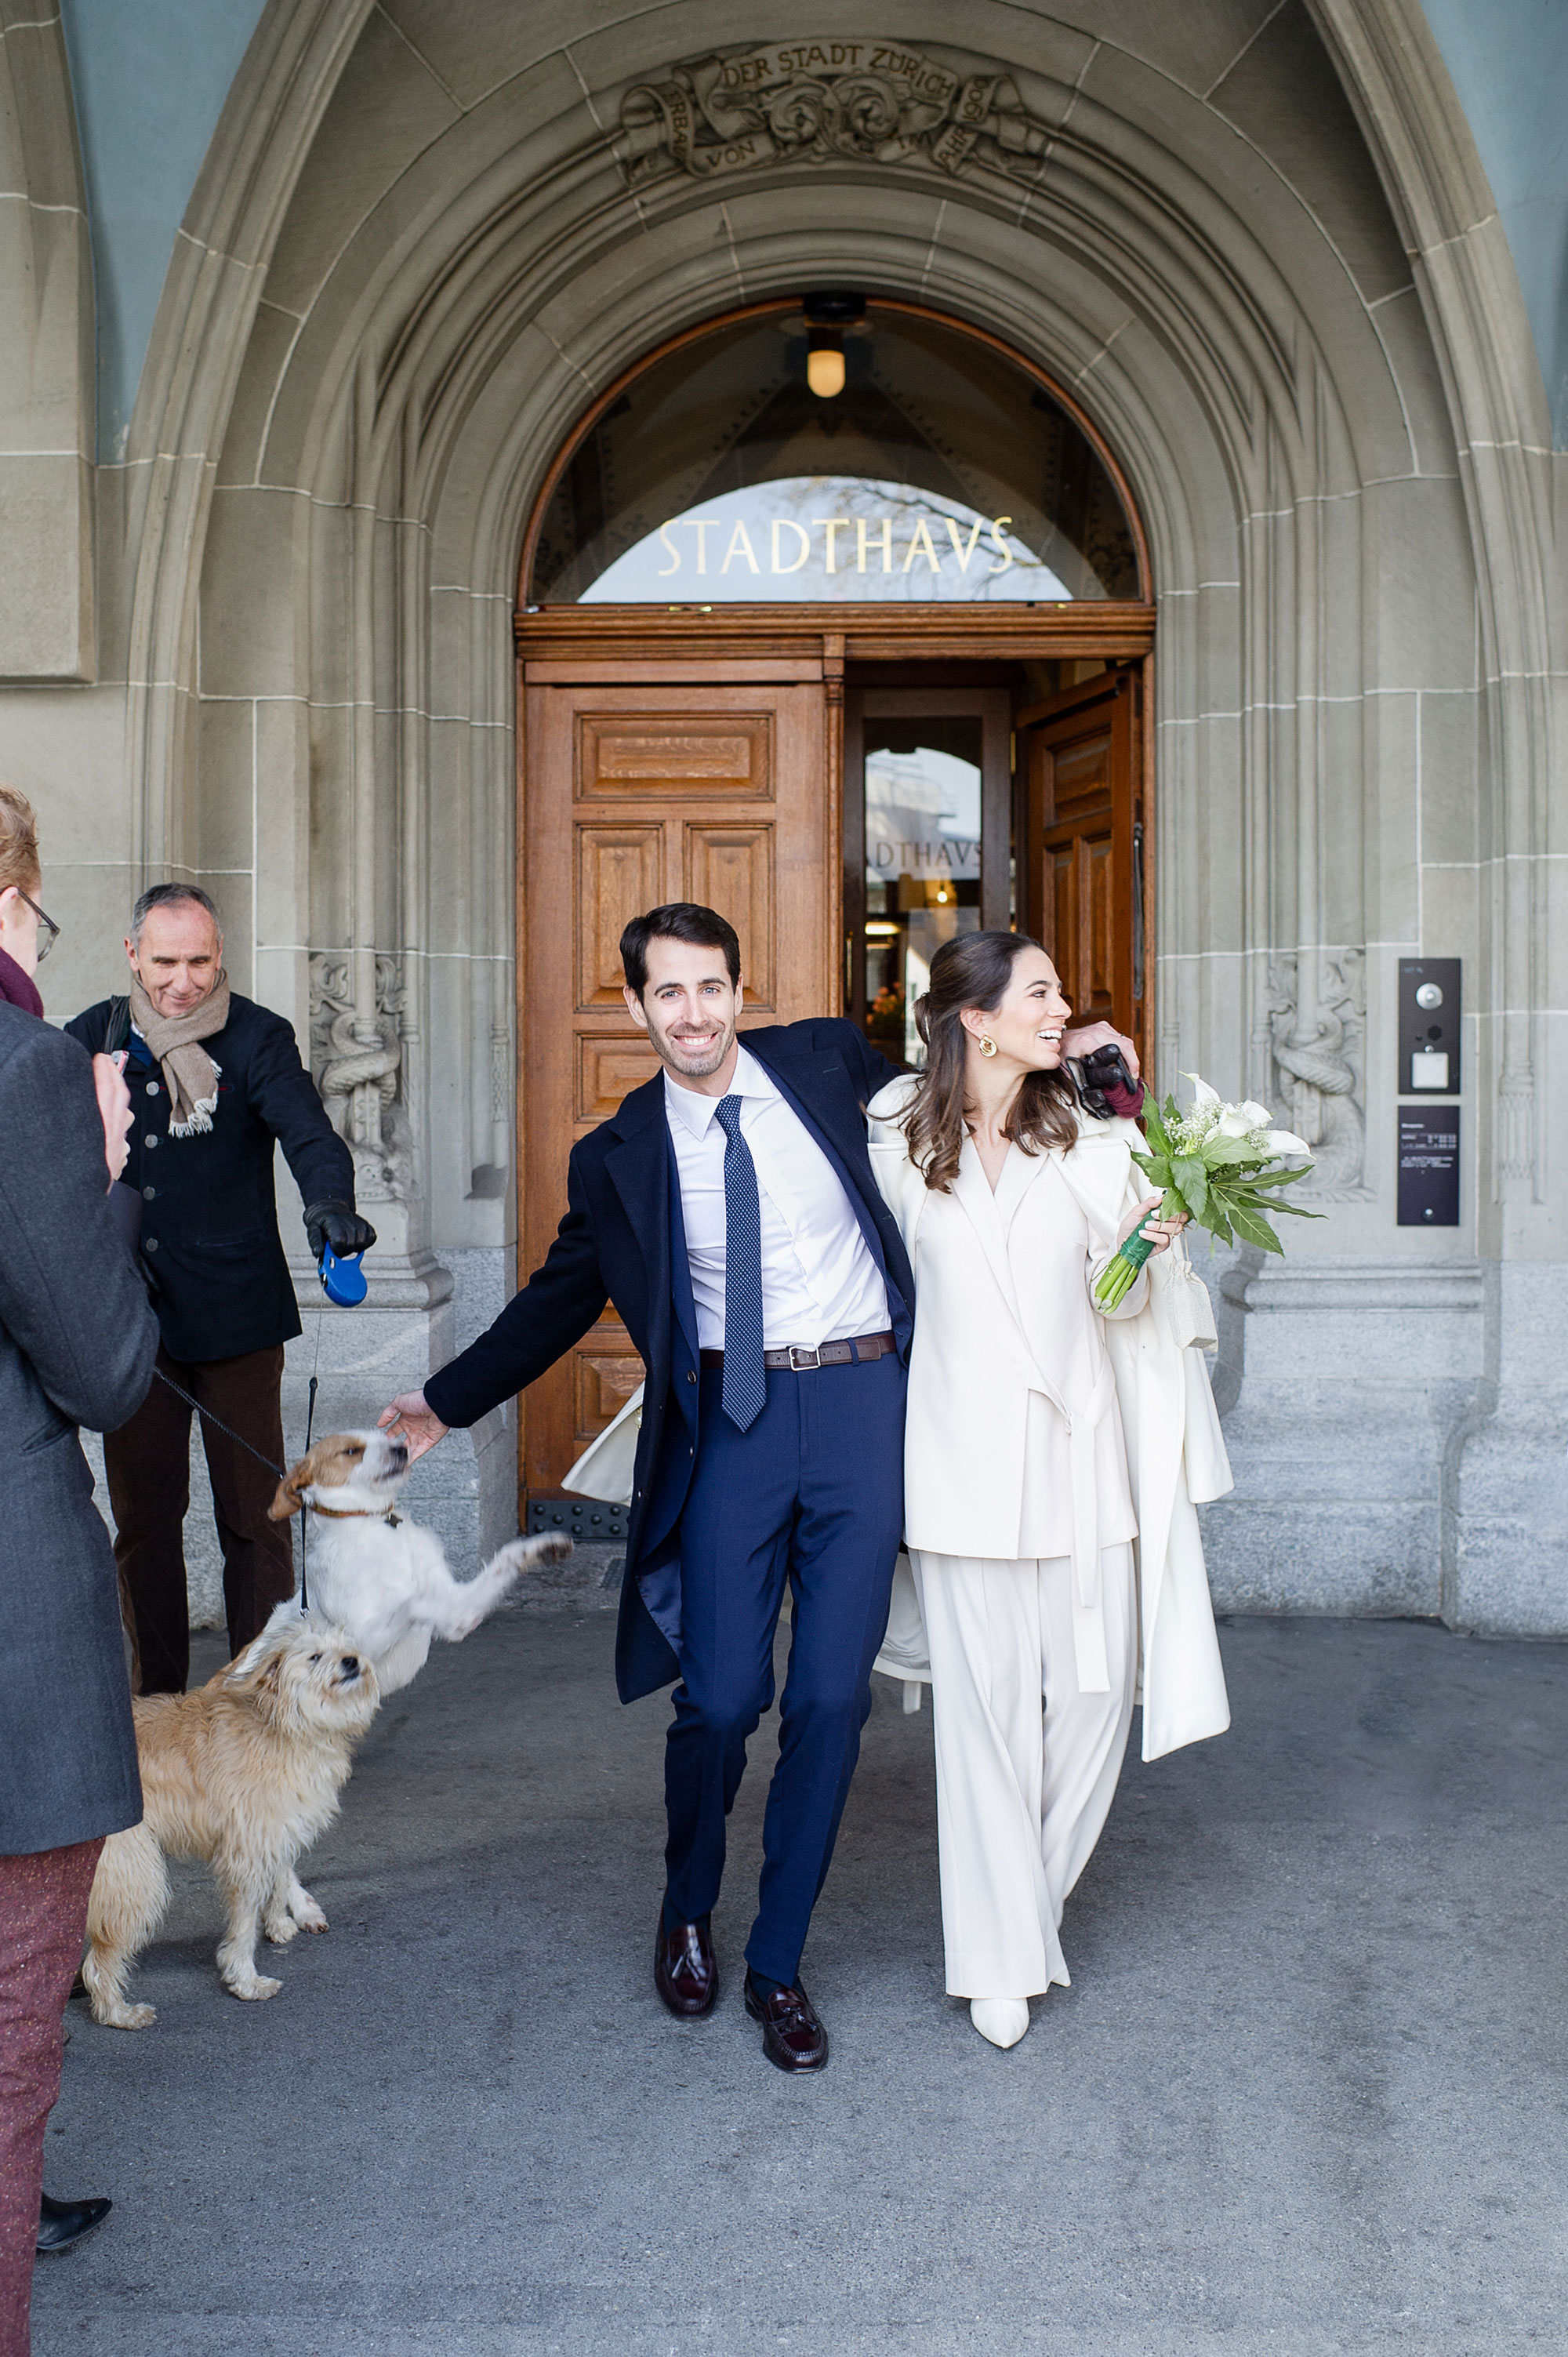 juliana-cosimo-stadthaus-wedding-11.jpg